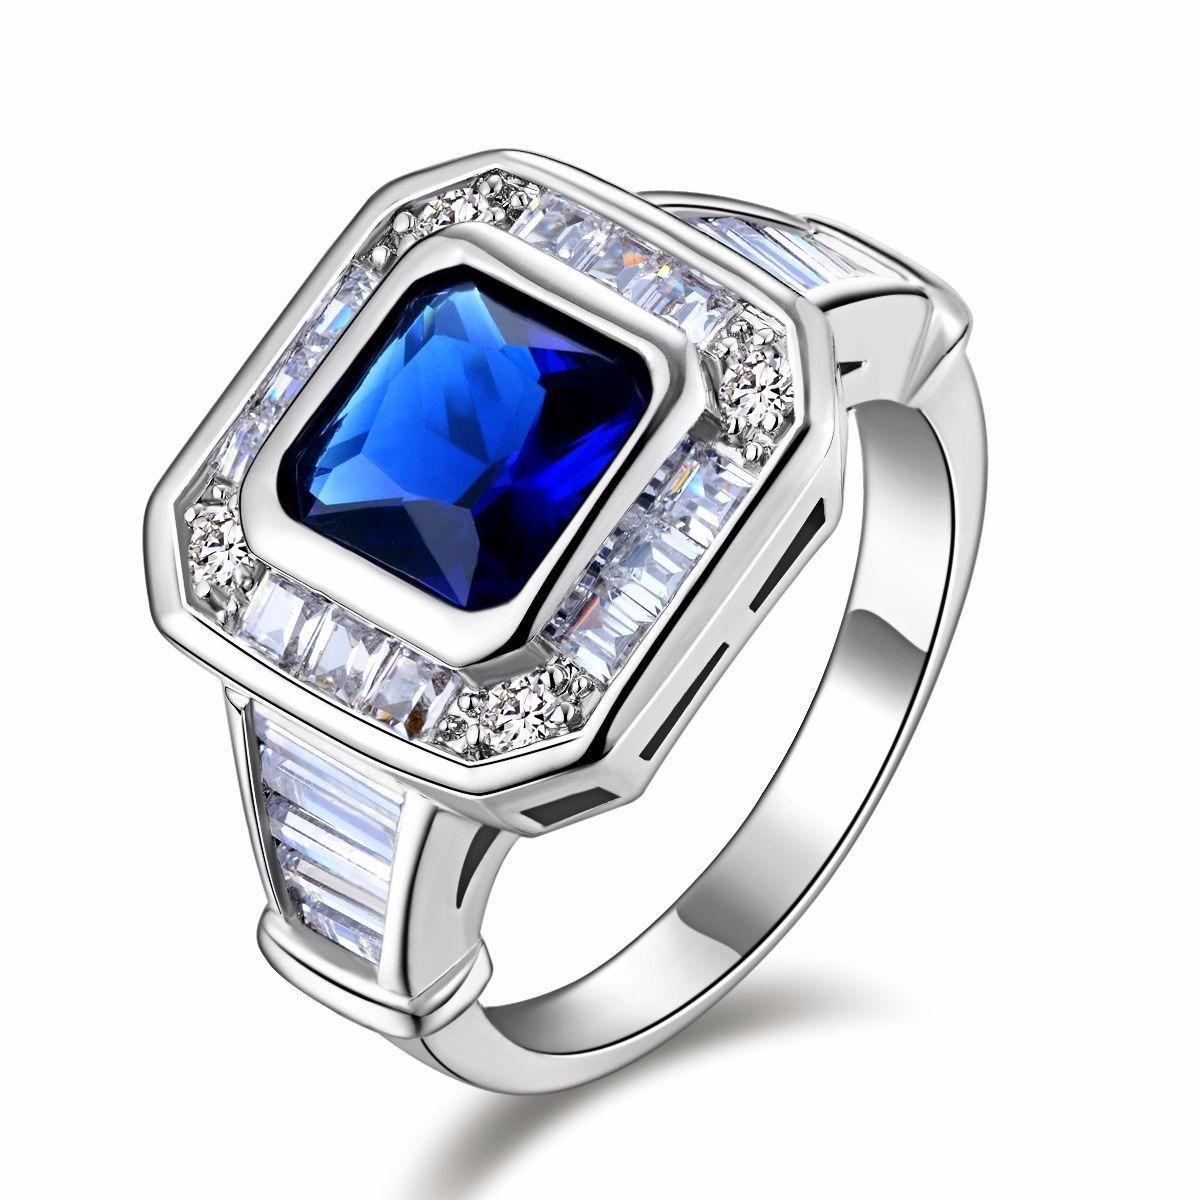 anel masculino aro 23 folheado ouro branco safira azul 2524a. Carregando  zoom. f3dfbc1ce6